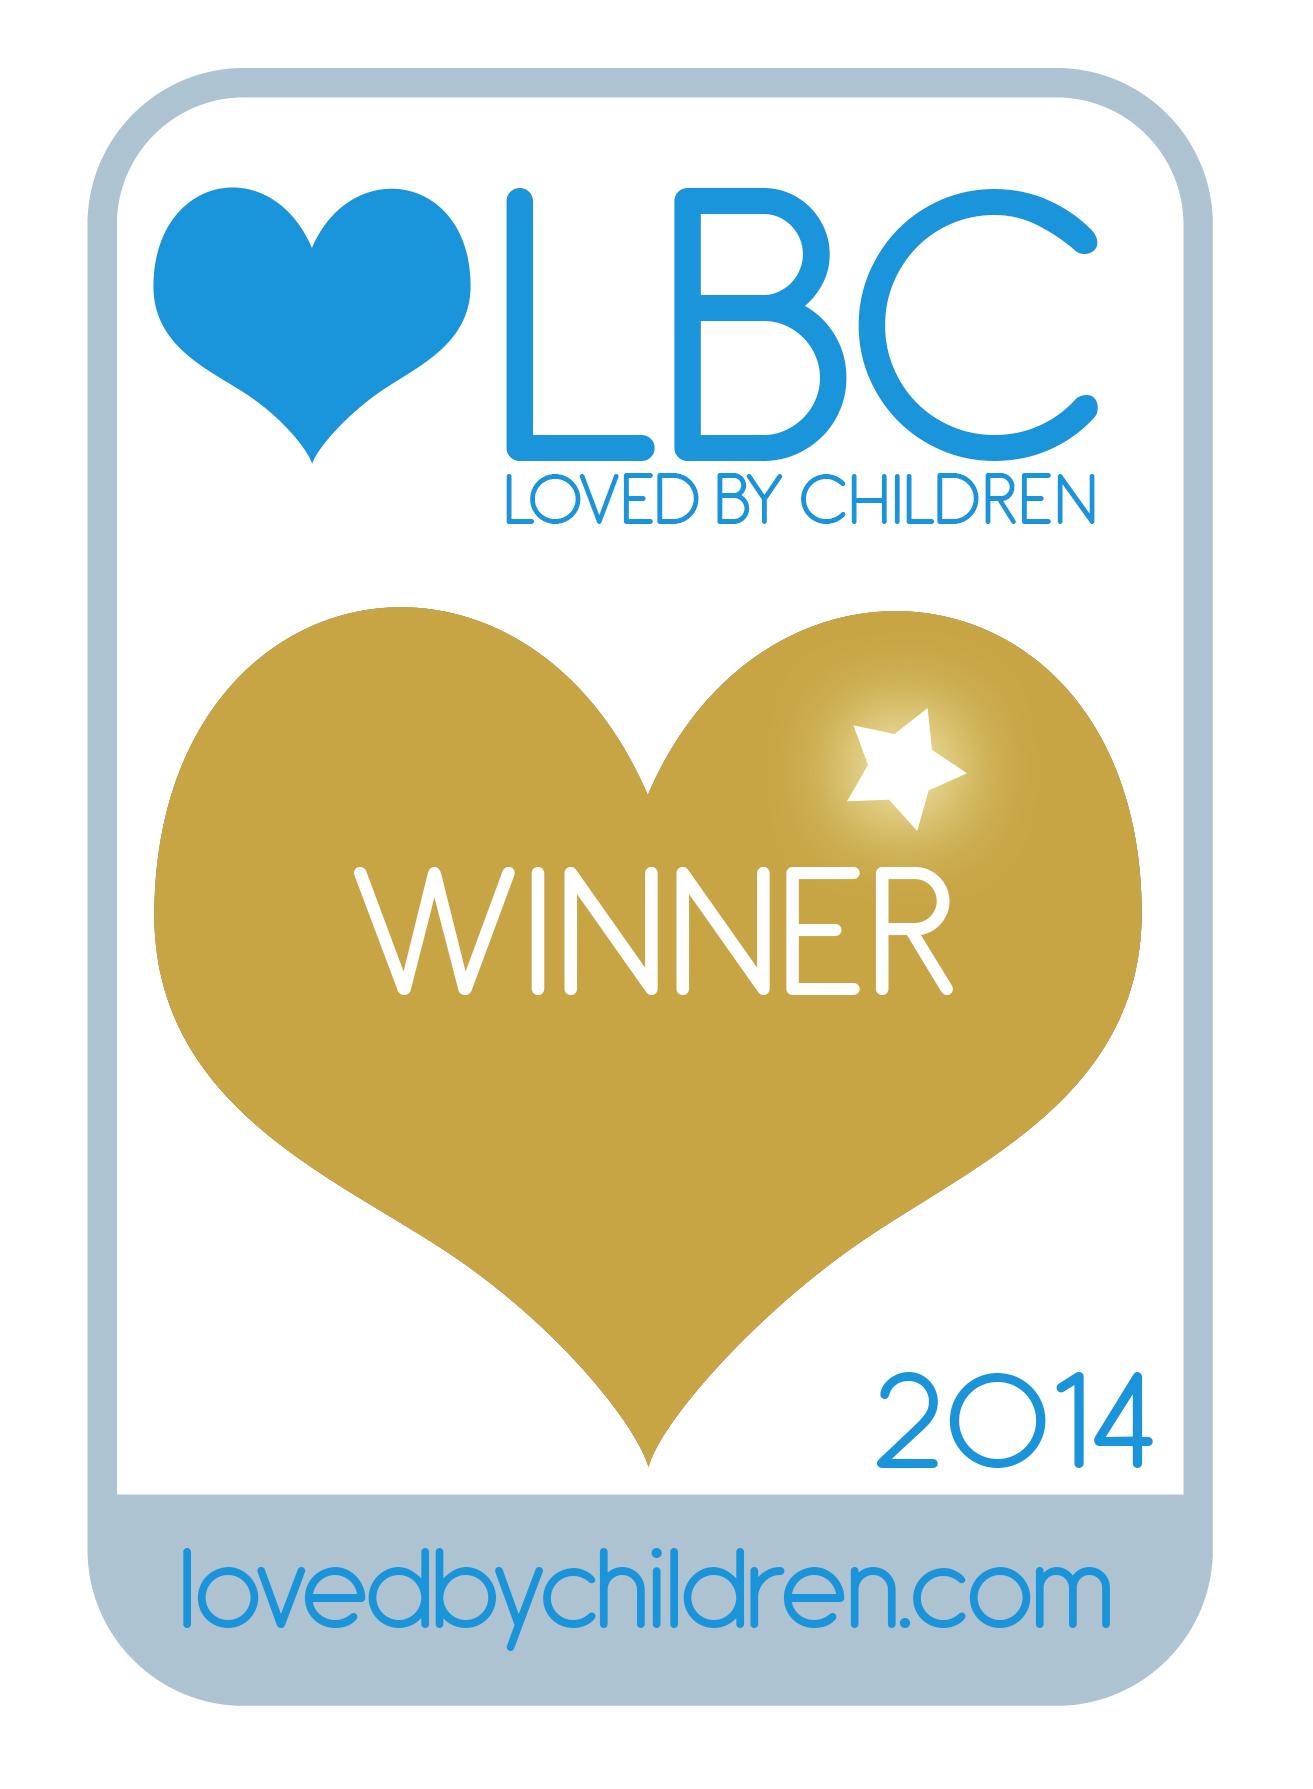 Loved by children award